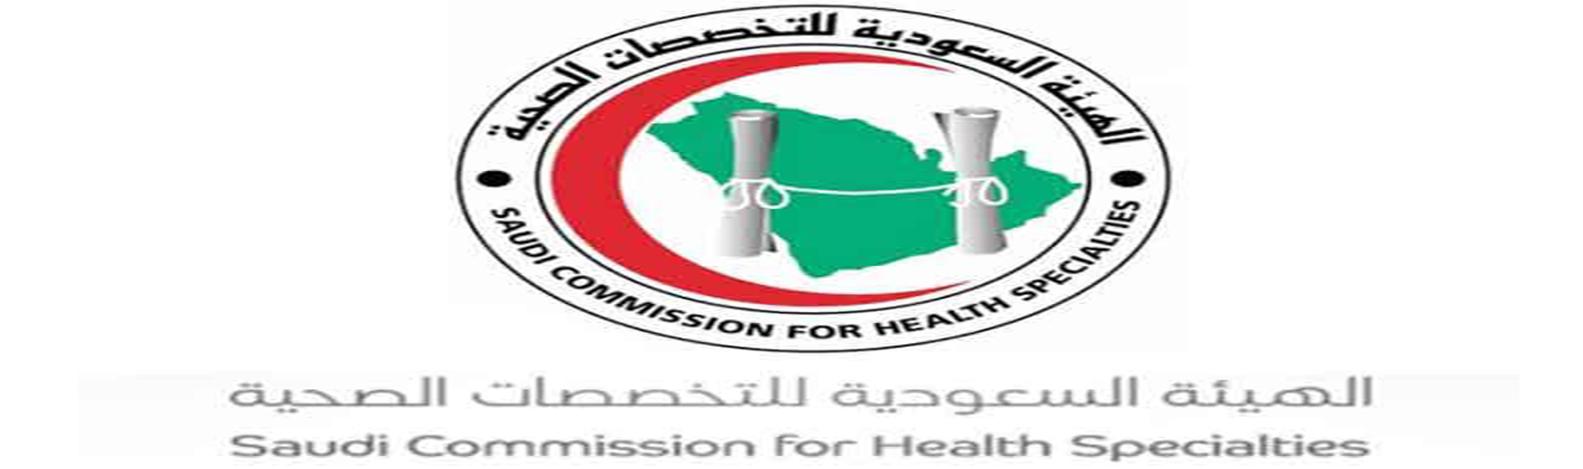 DHA UAE MOH HAAD QATAR PROMETRIC SAUDI PROMETRIC